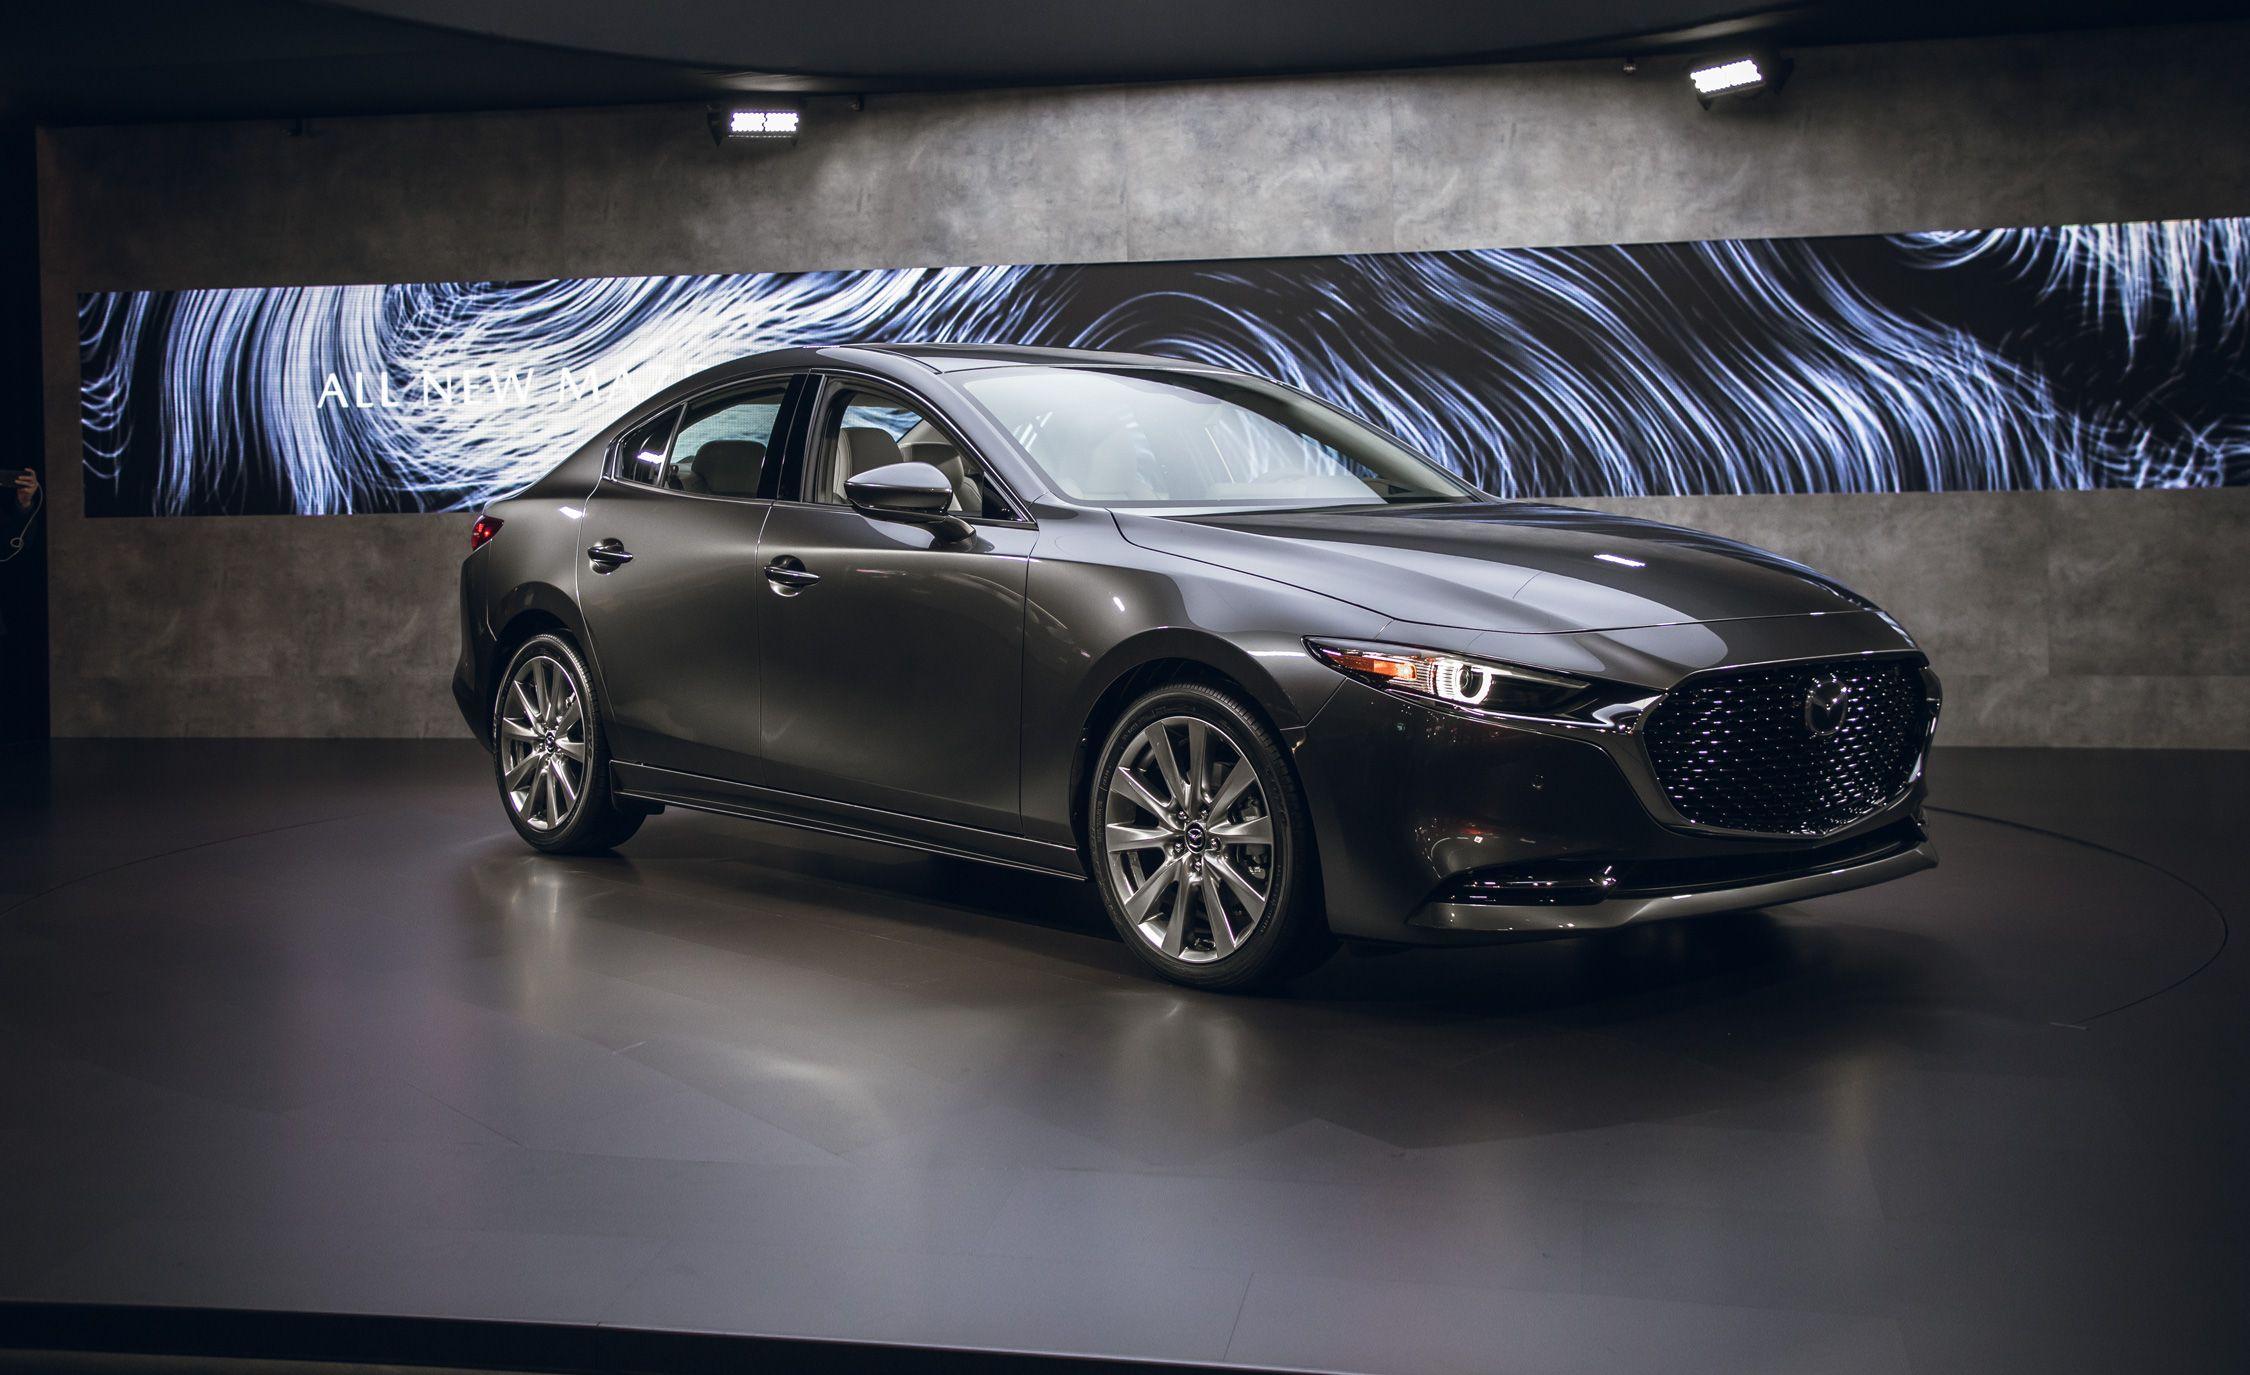 2019 Mazda 3 Revealed Skyactiv Engines Newly Available All Wheel Drive